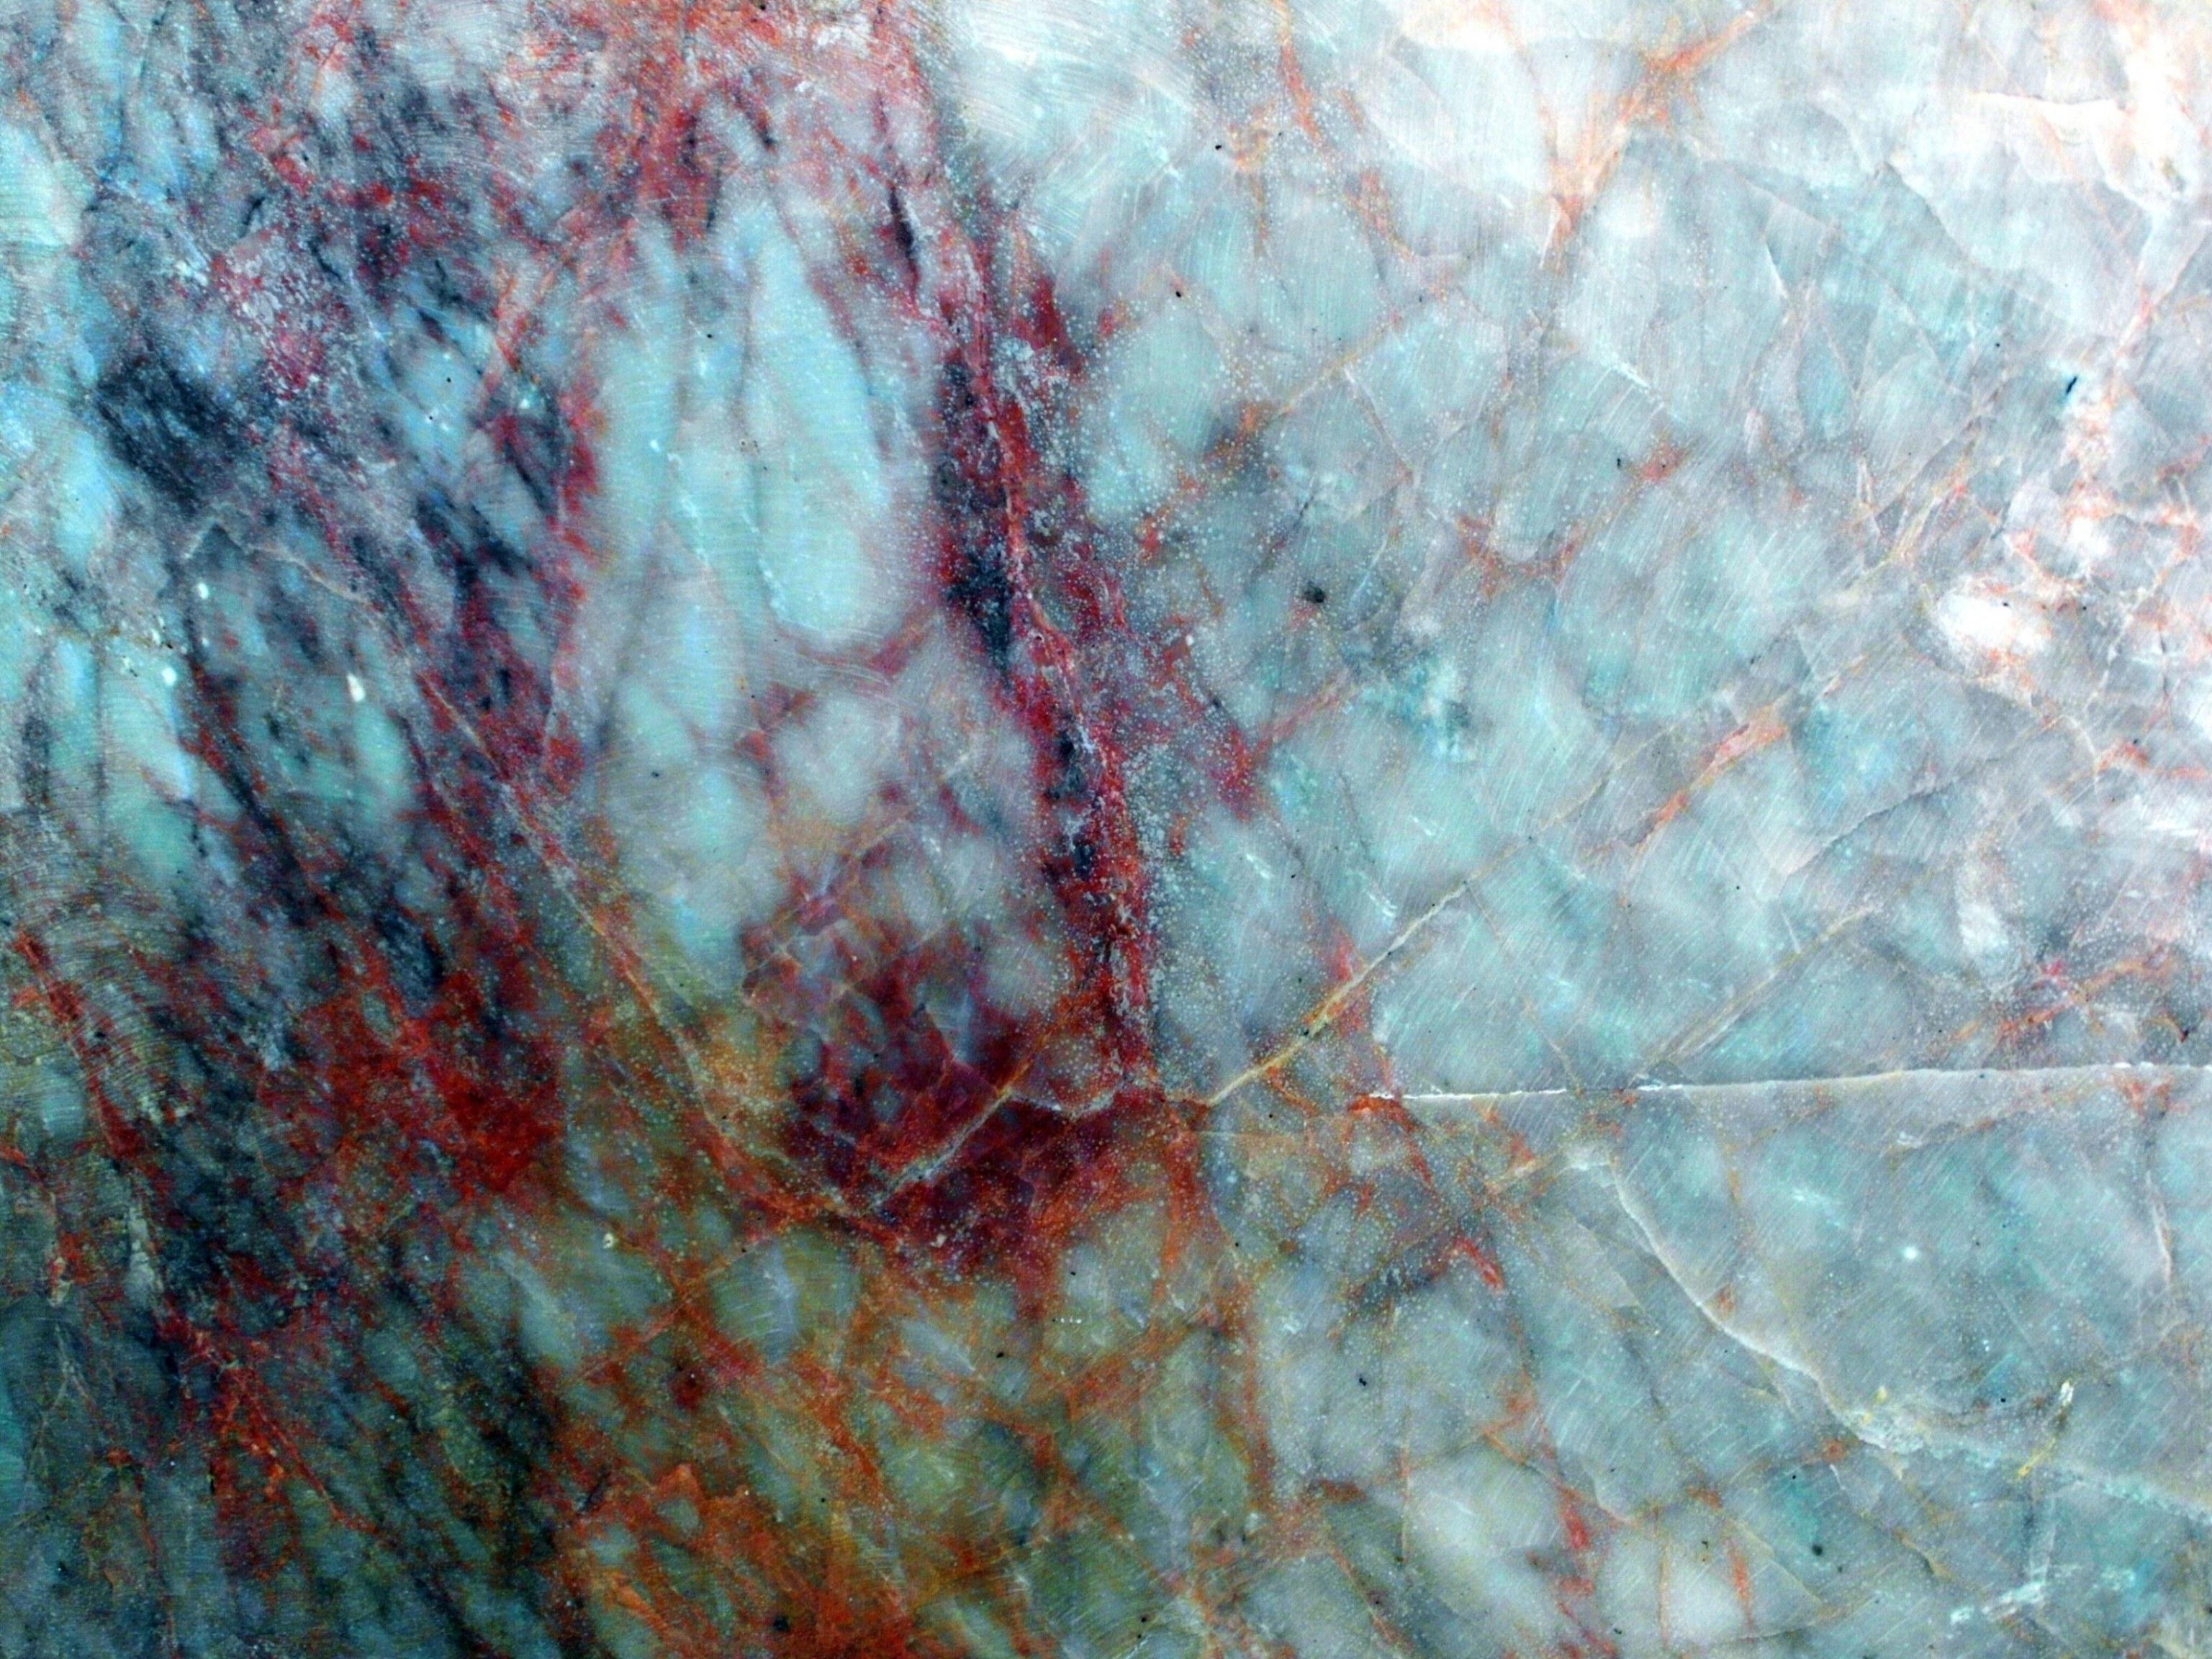 Multi-Colored Rock Background, Abstract, Quartz, Mineral, Minerals, HQ Photo